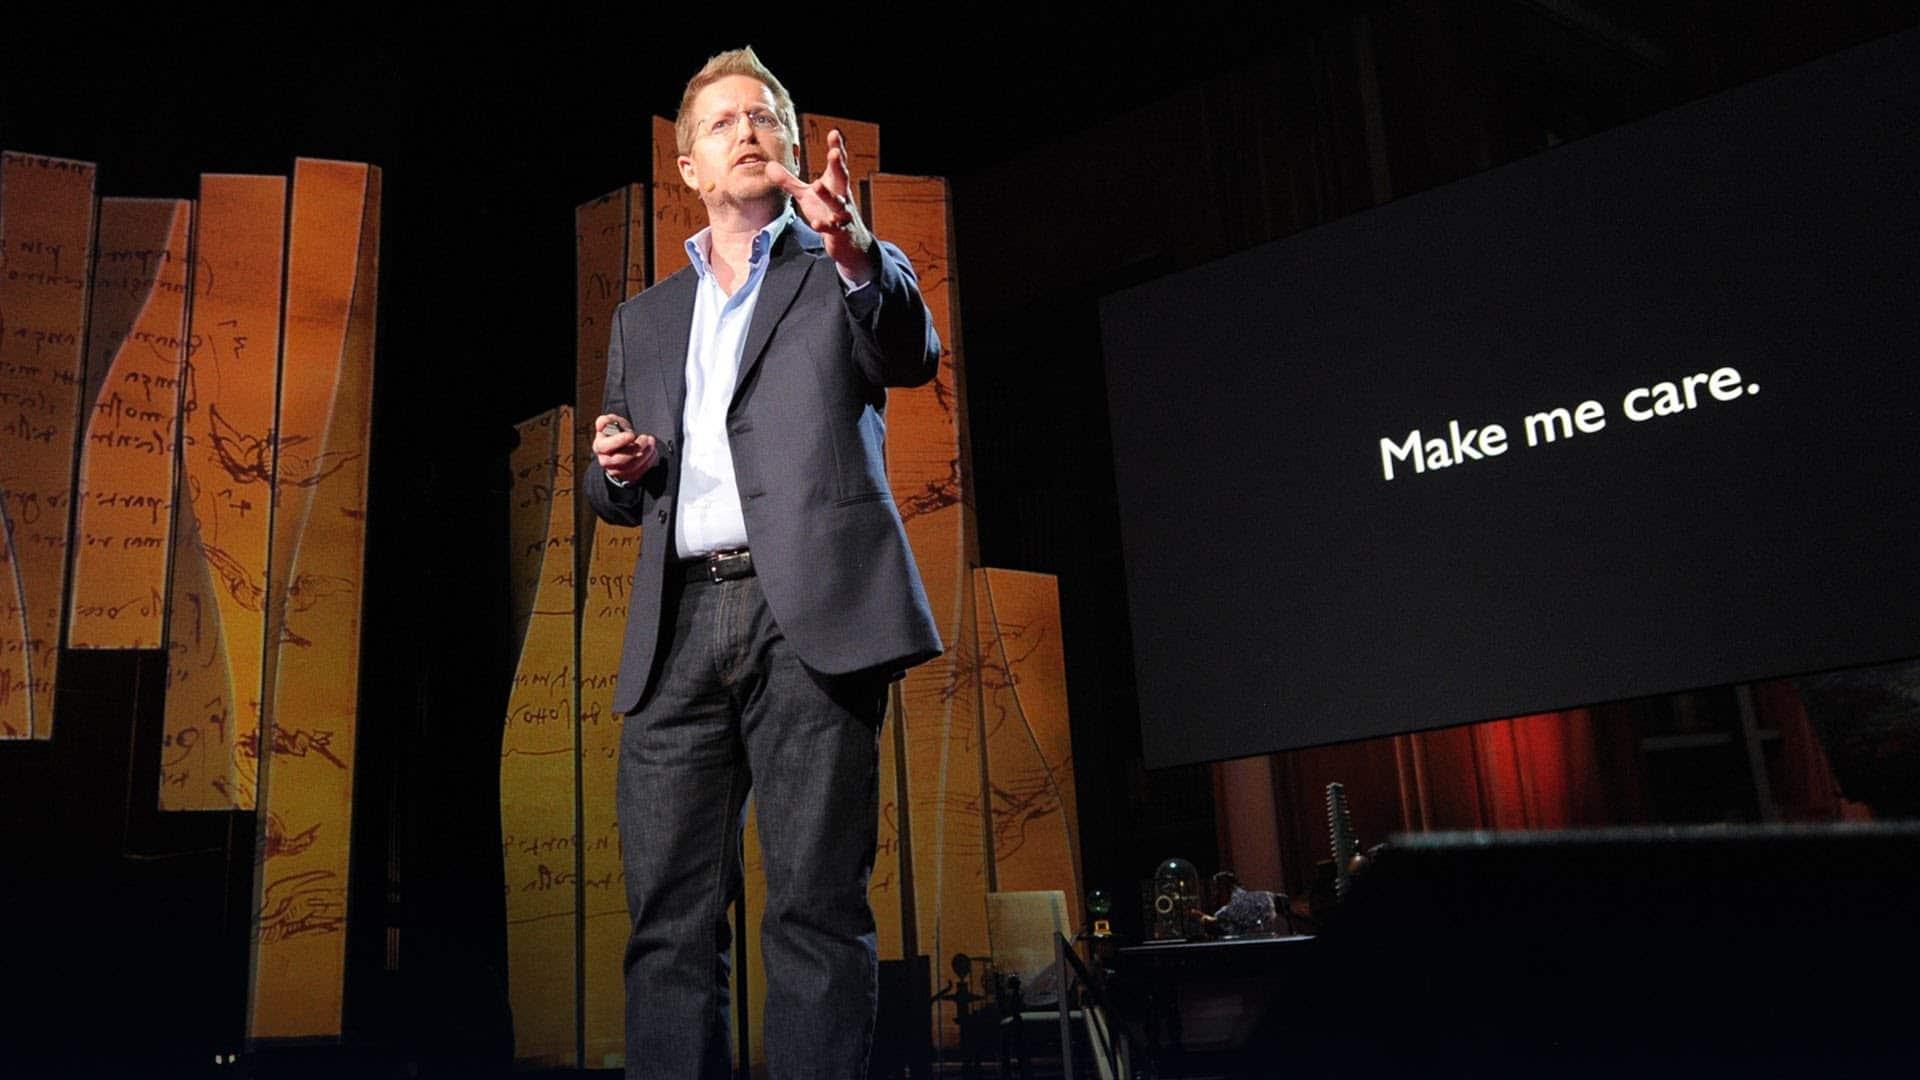 TED Talk Marketing - Andrew Stanton